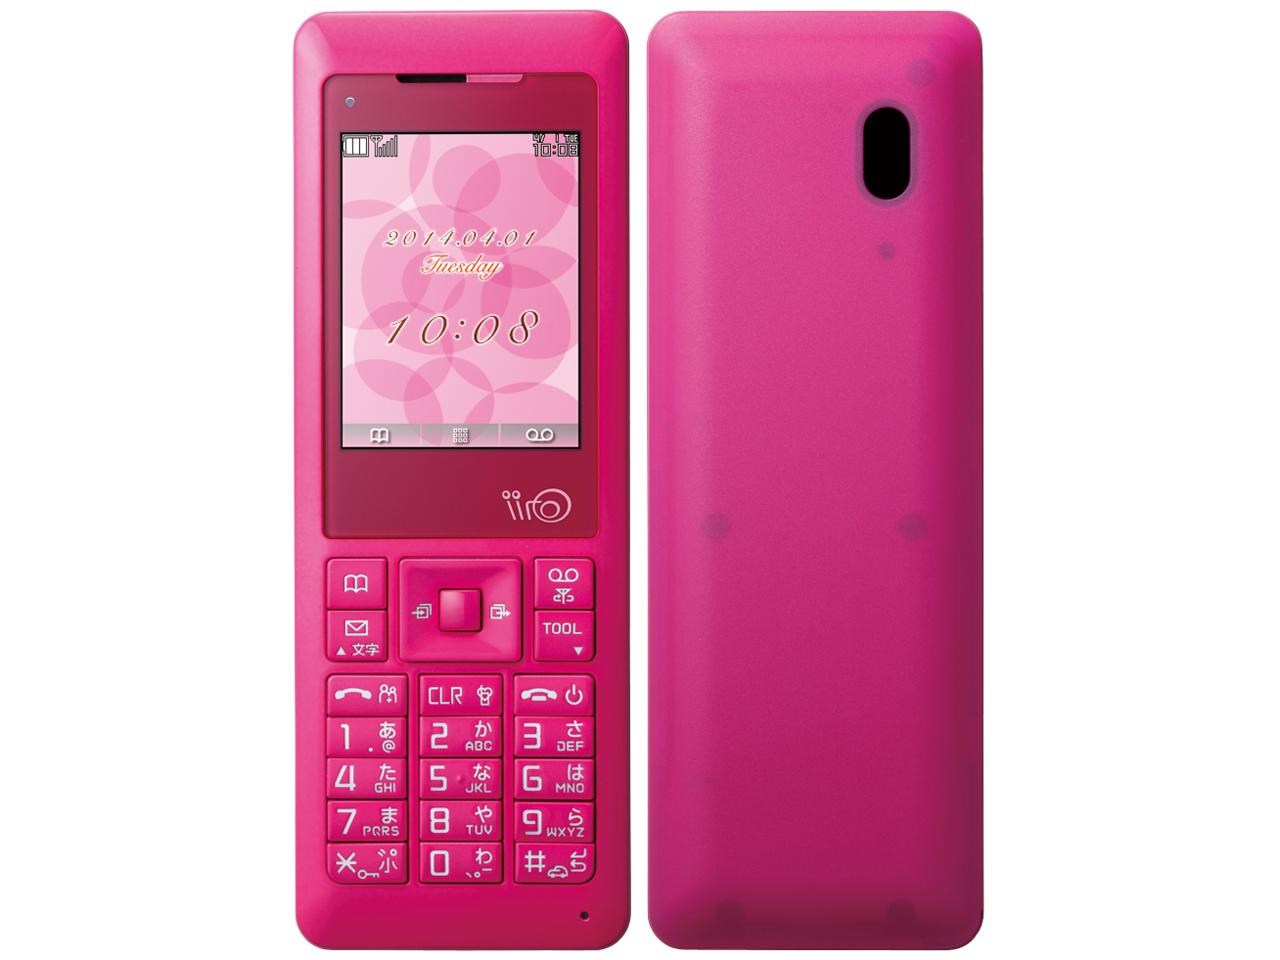 iiro WX04S [ピンク] の製品画像